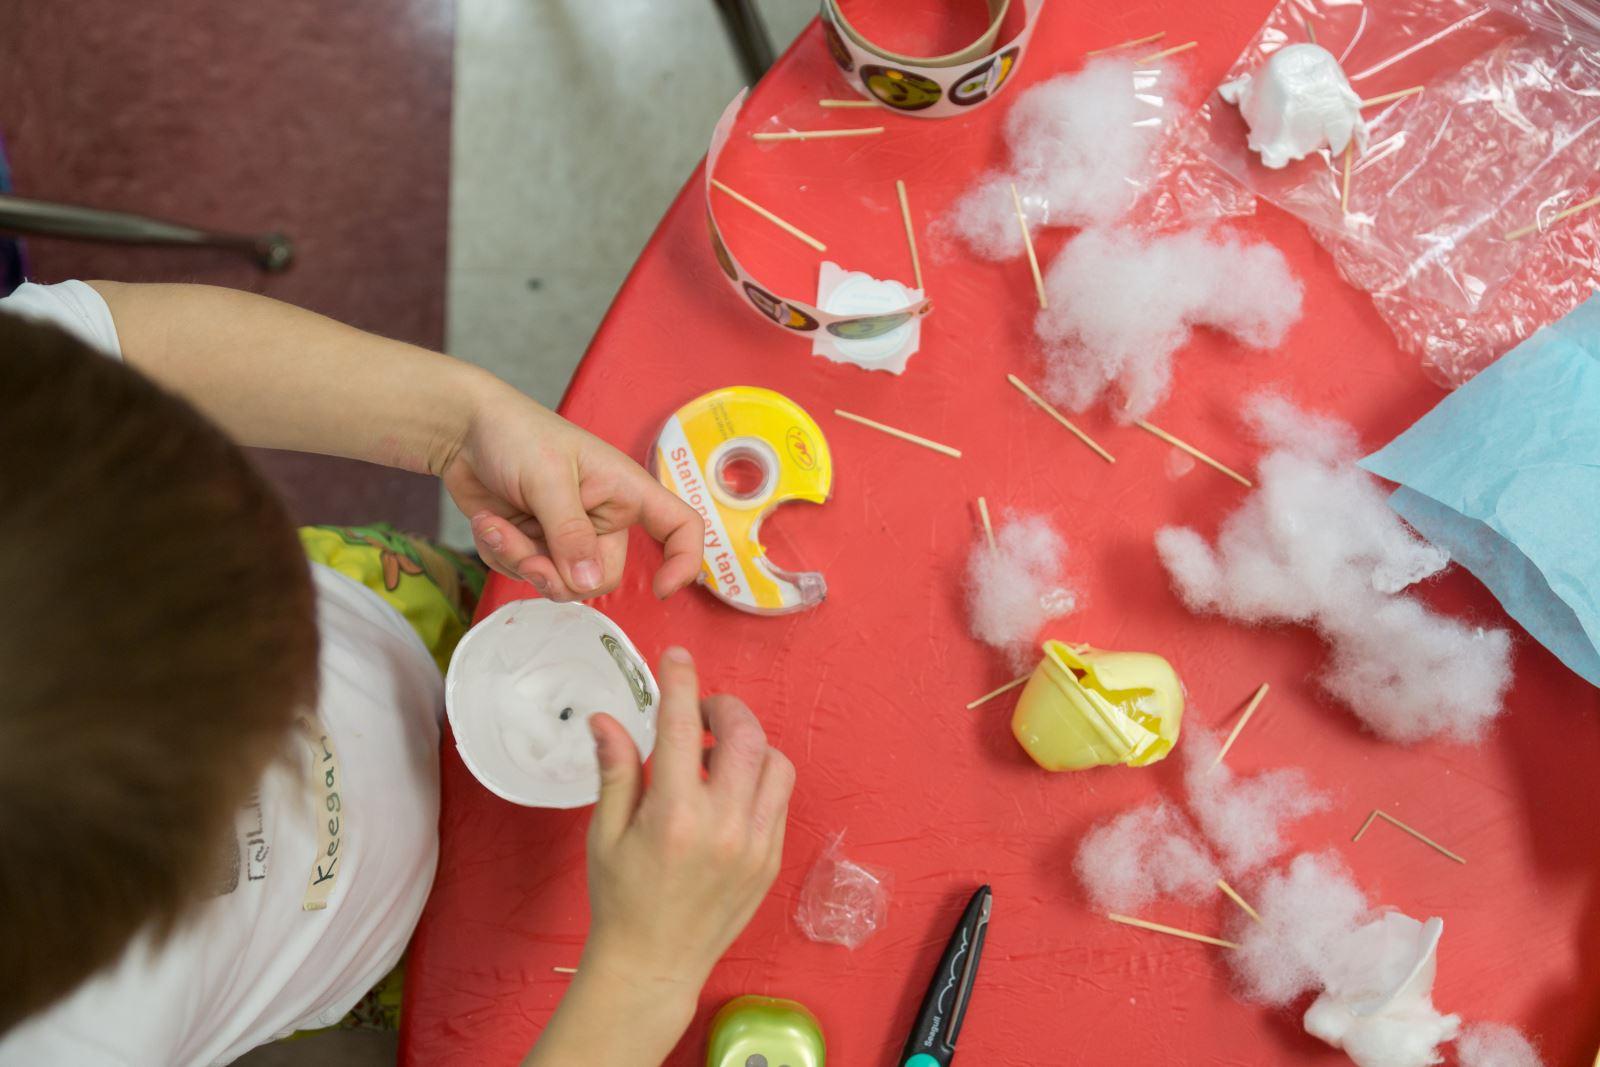 child doing crafts